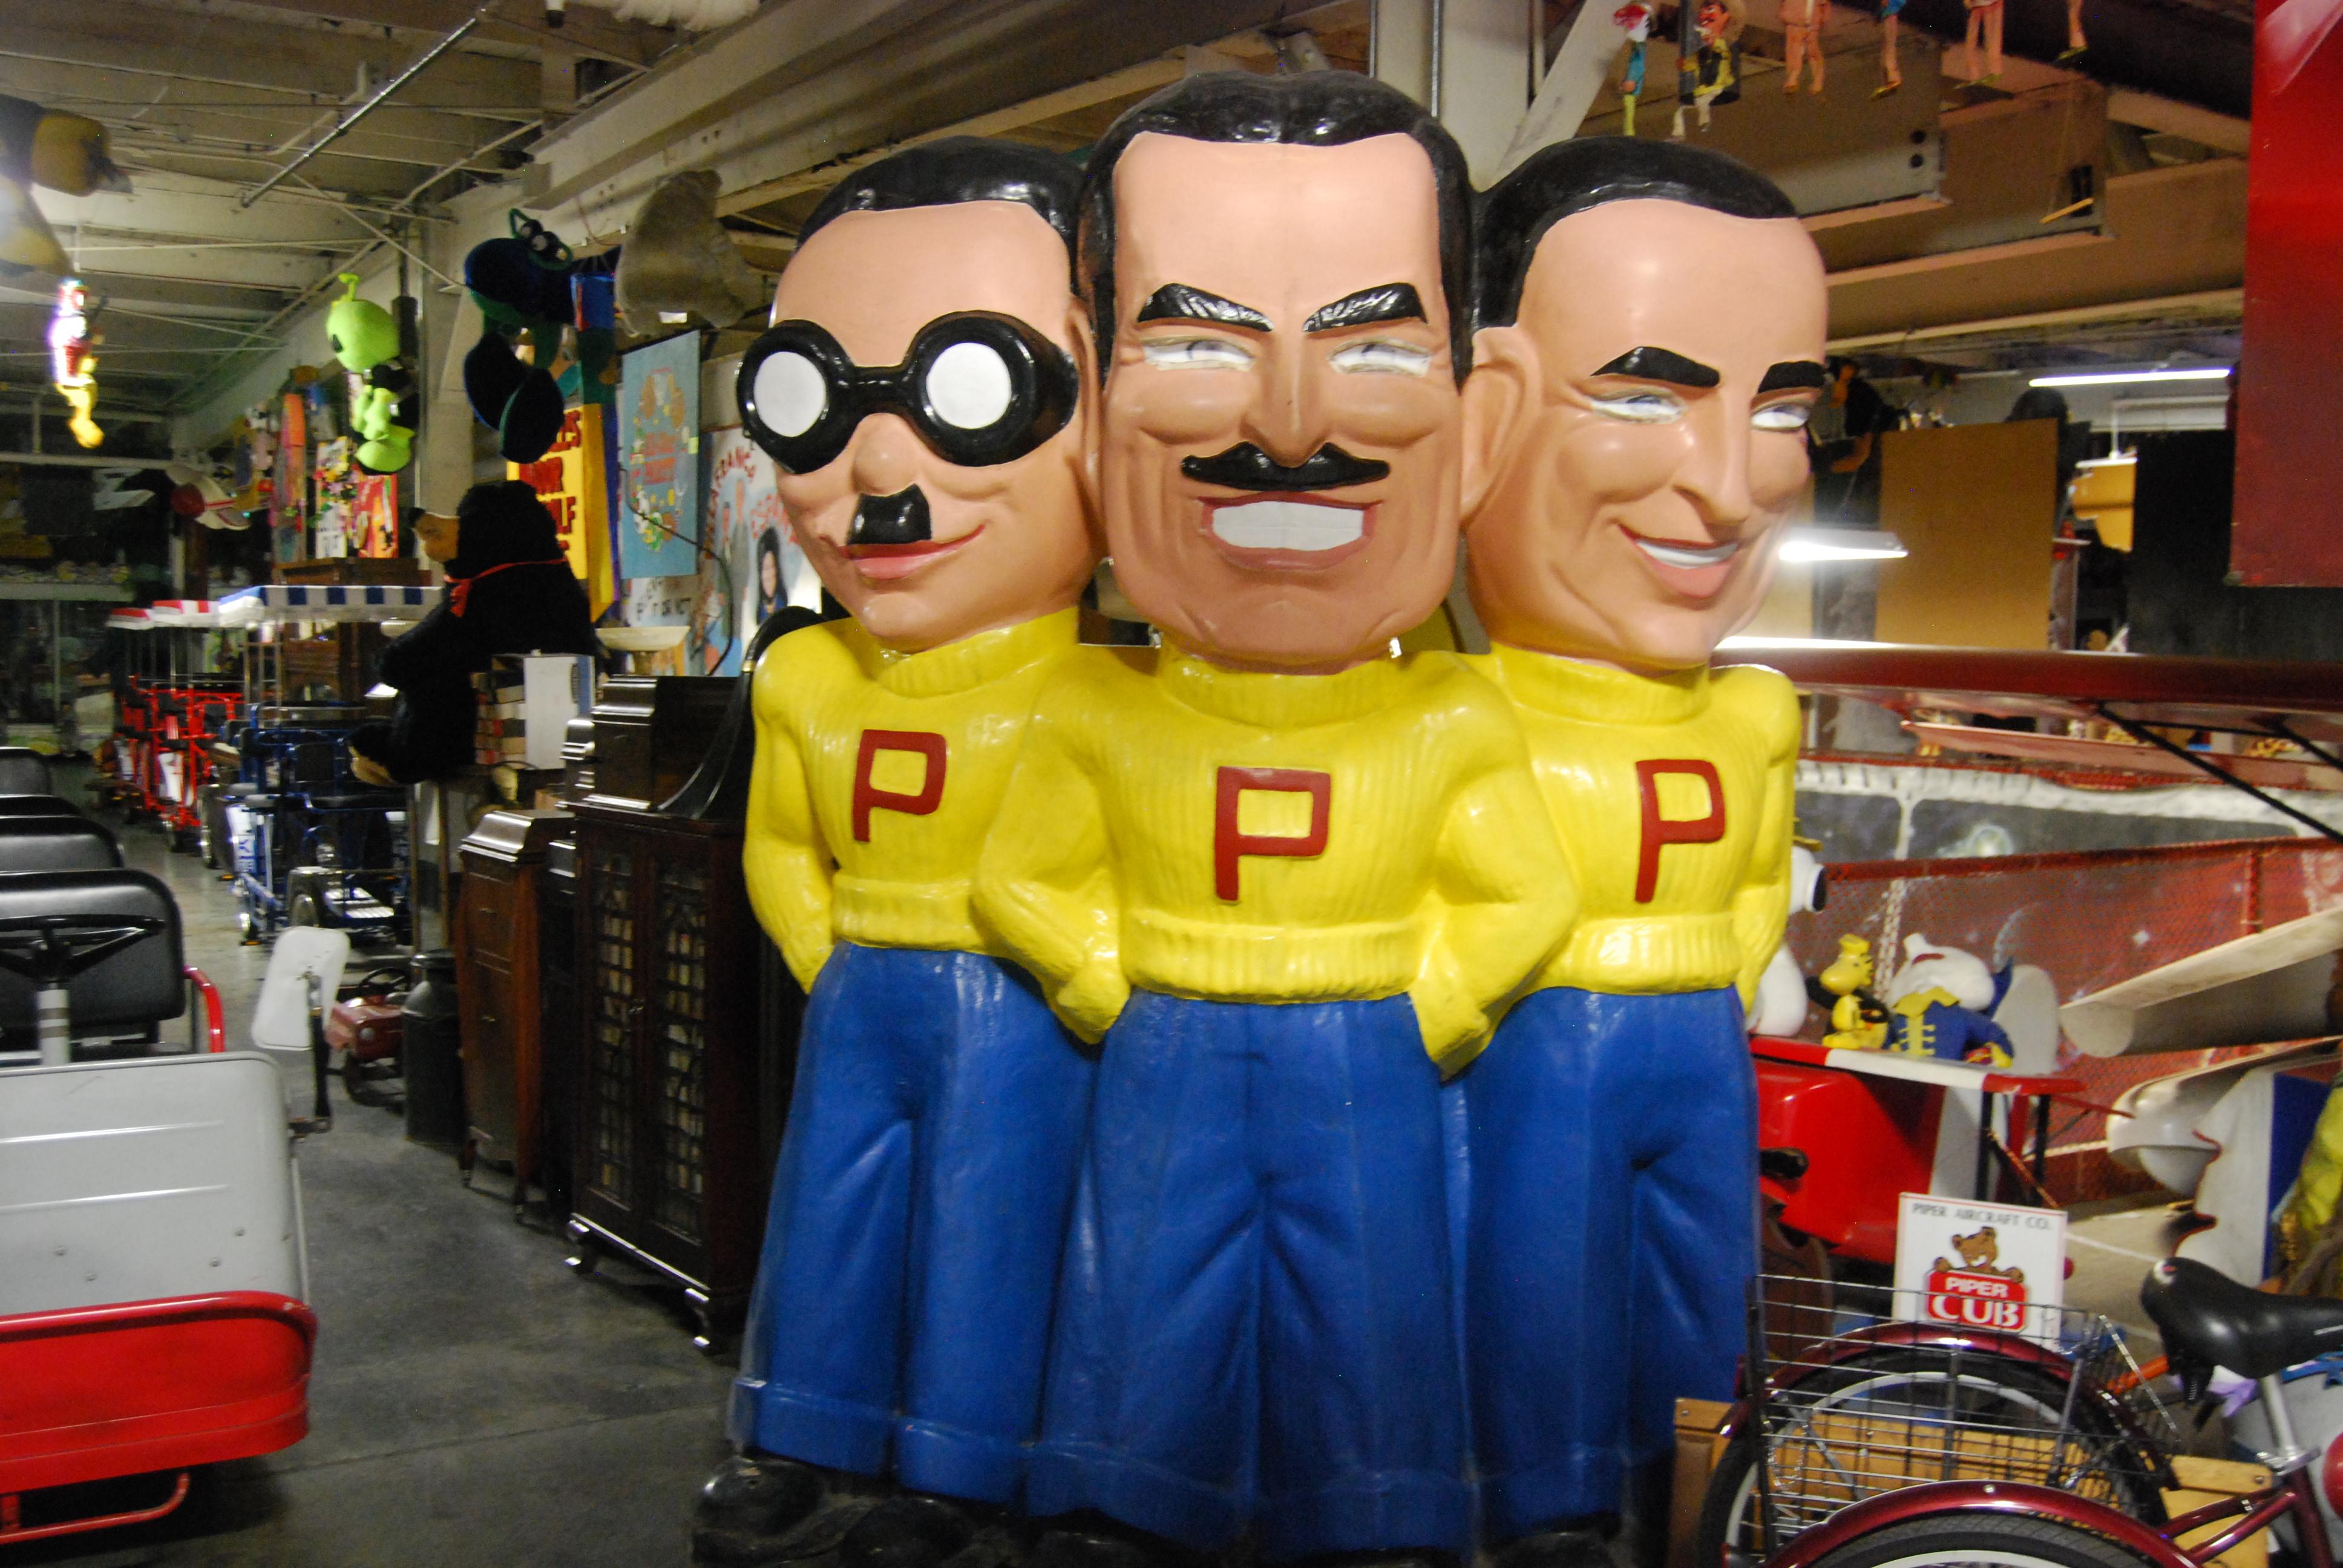 File:Pep Boys.JPG - Wikimedia Commons